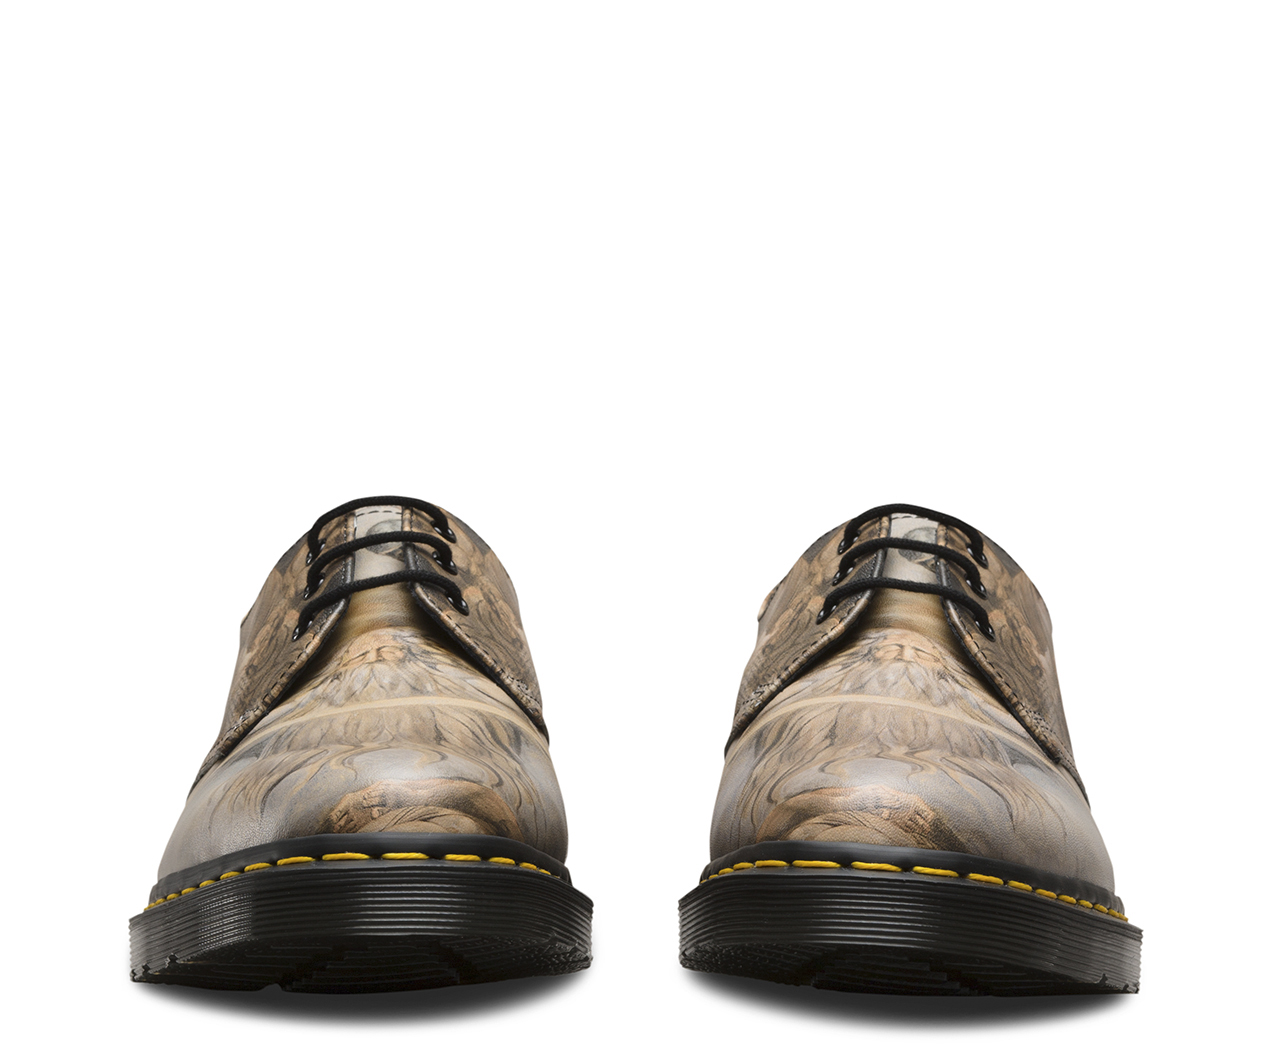 Dr Martens Unisexe 1461 William Blake Cuir 3 Yeux Lacer Blanc Chaussures - Esprit - 38 Eu EUDLBXB